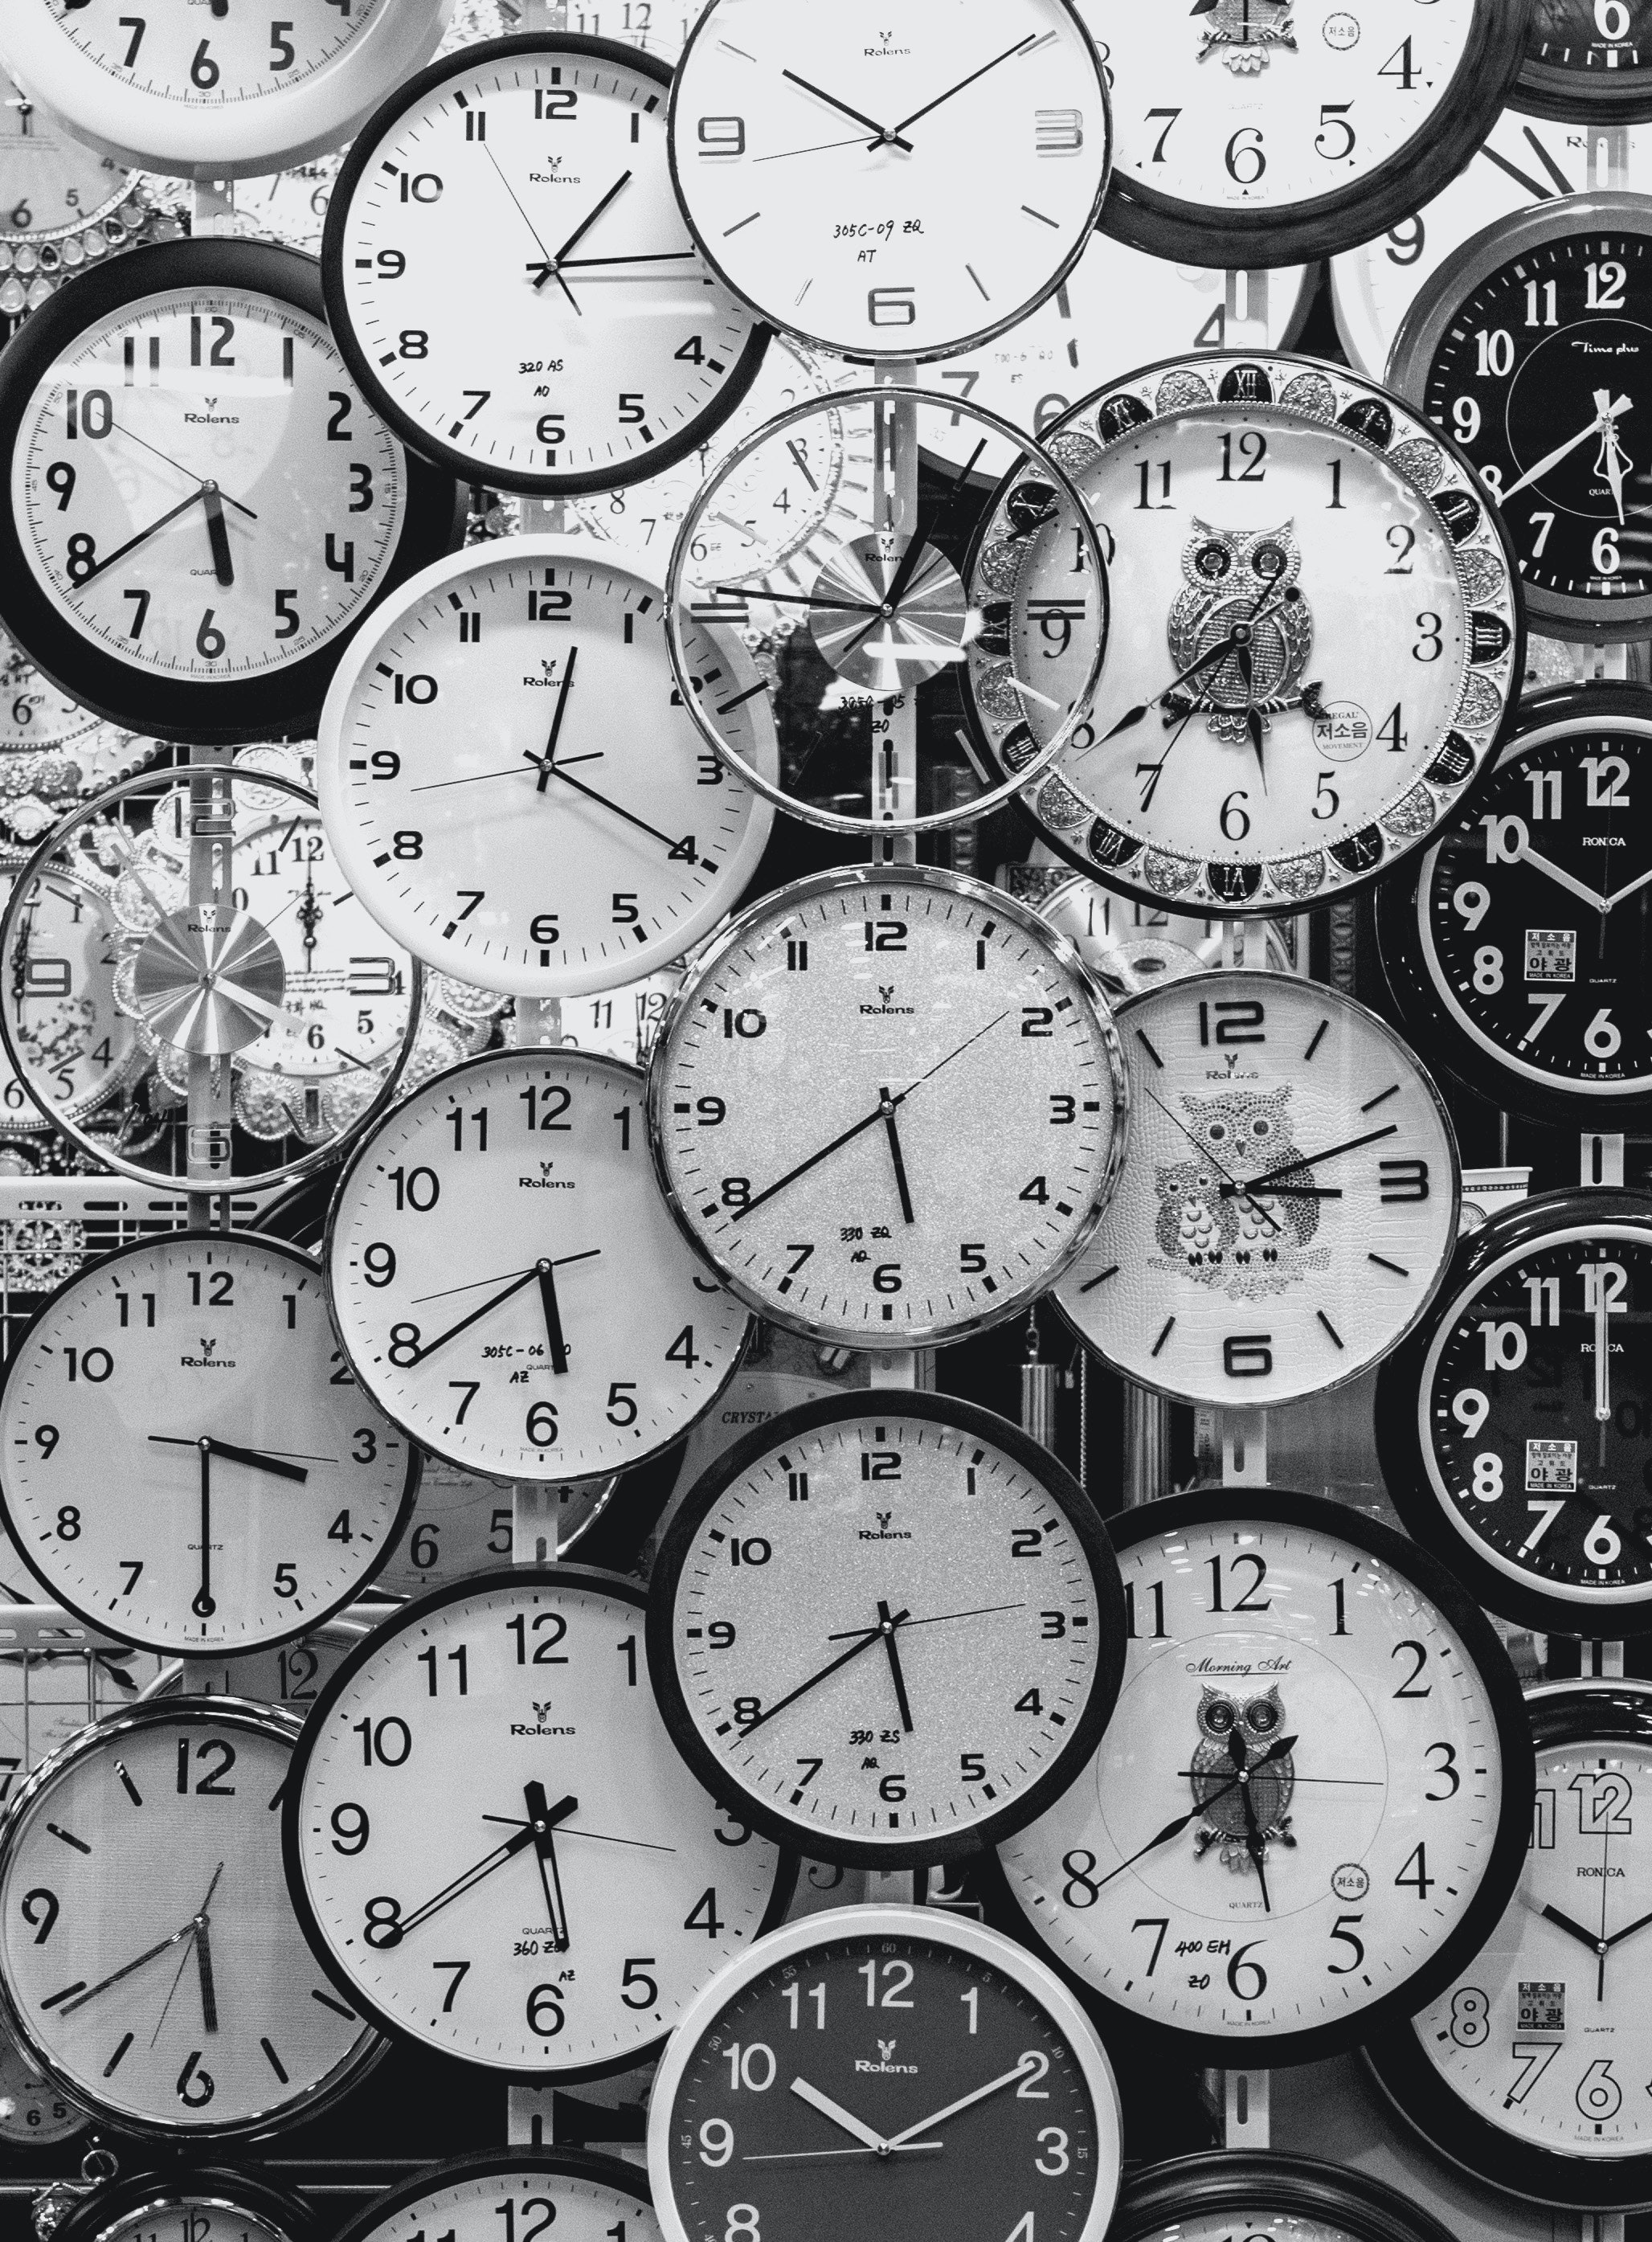 Black and white photo of clocks andrey grushnikov